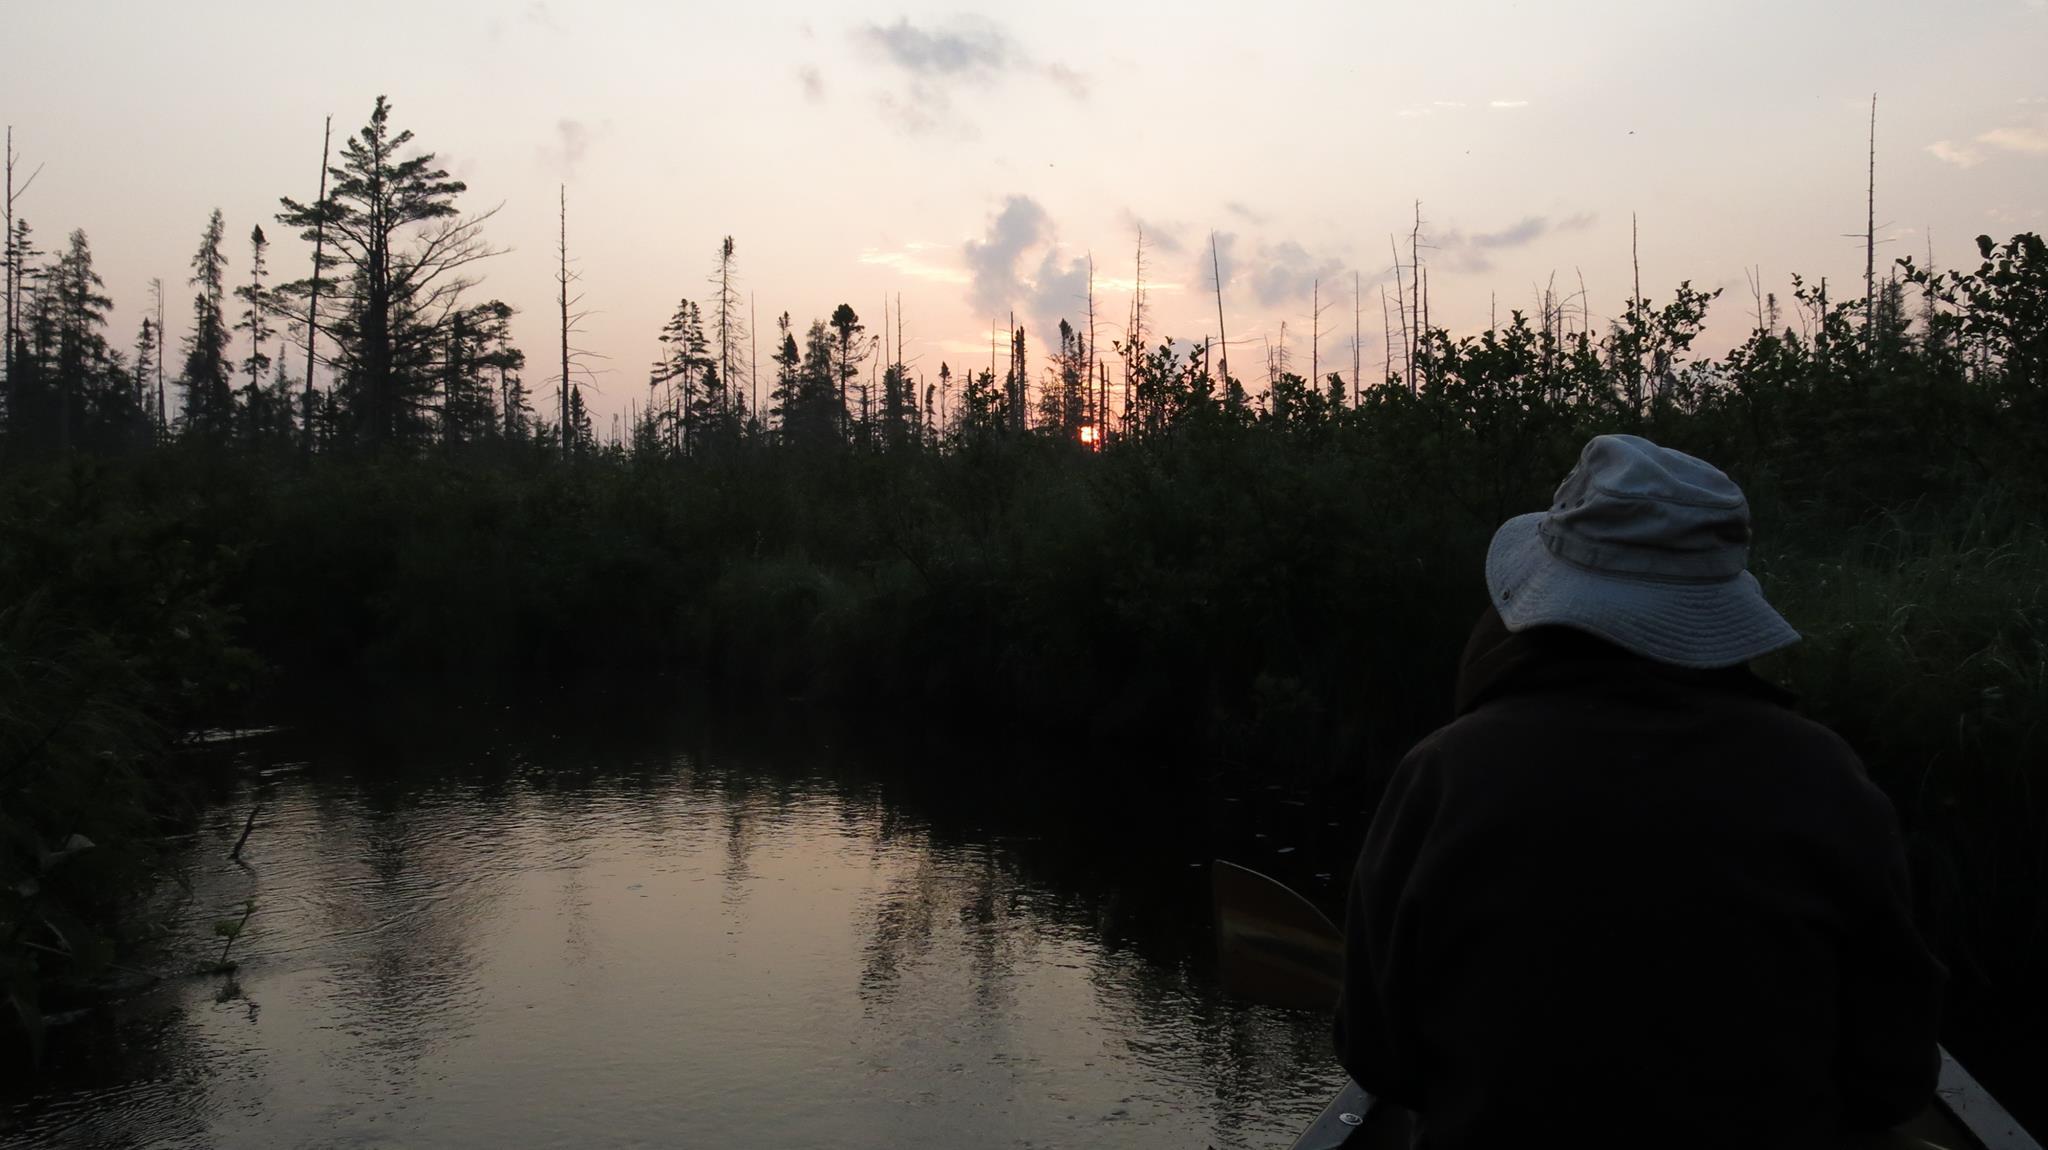 Sunrise in the boreal peatlands during the 2013 bird surveys.